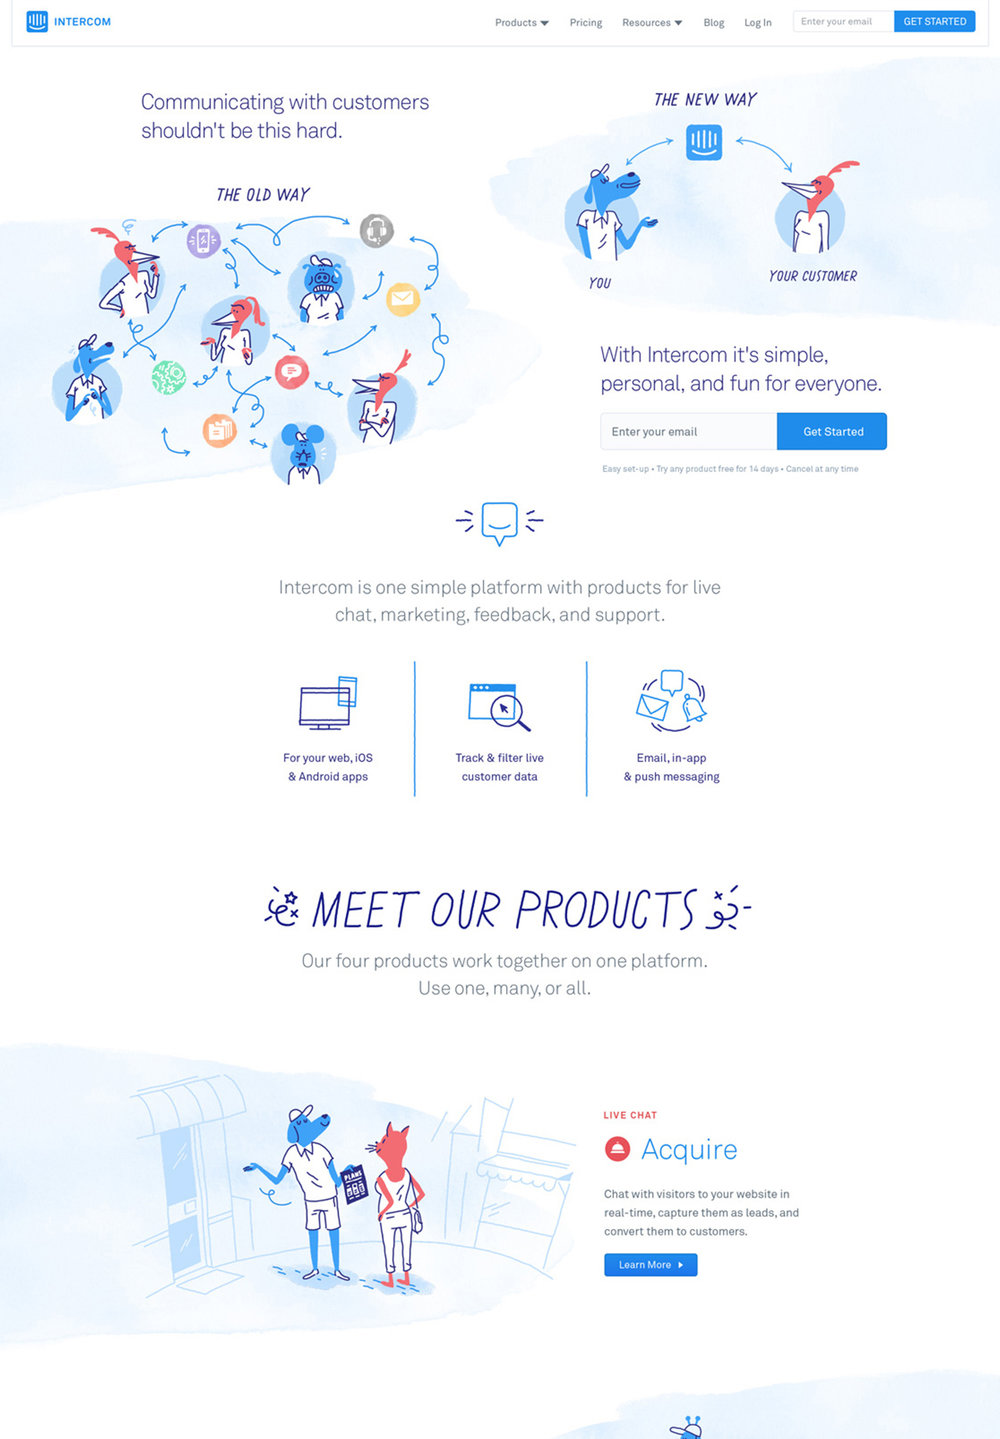 Intercom website,2016